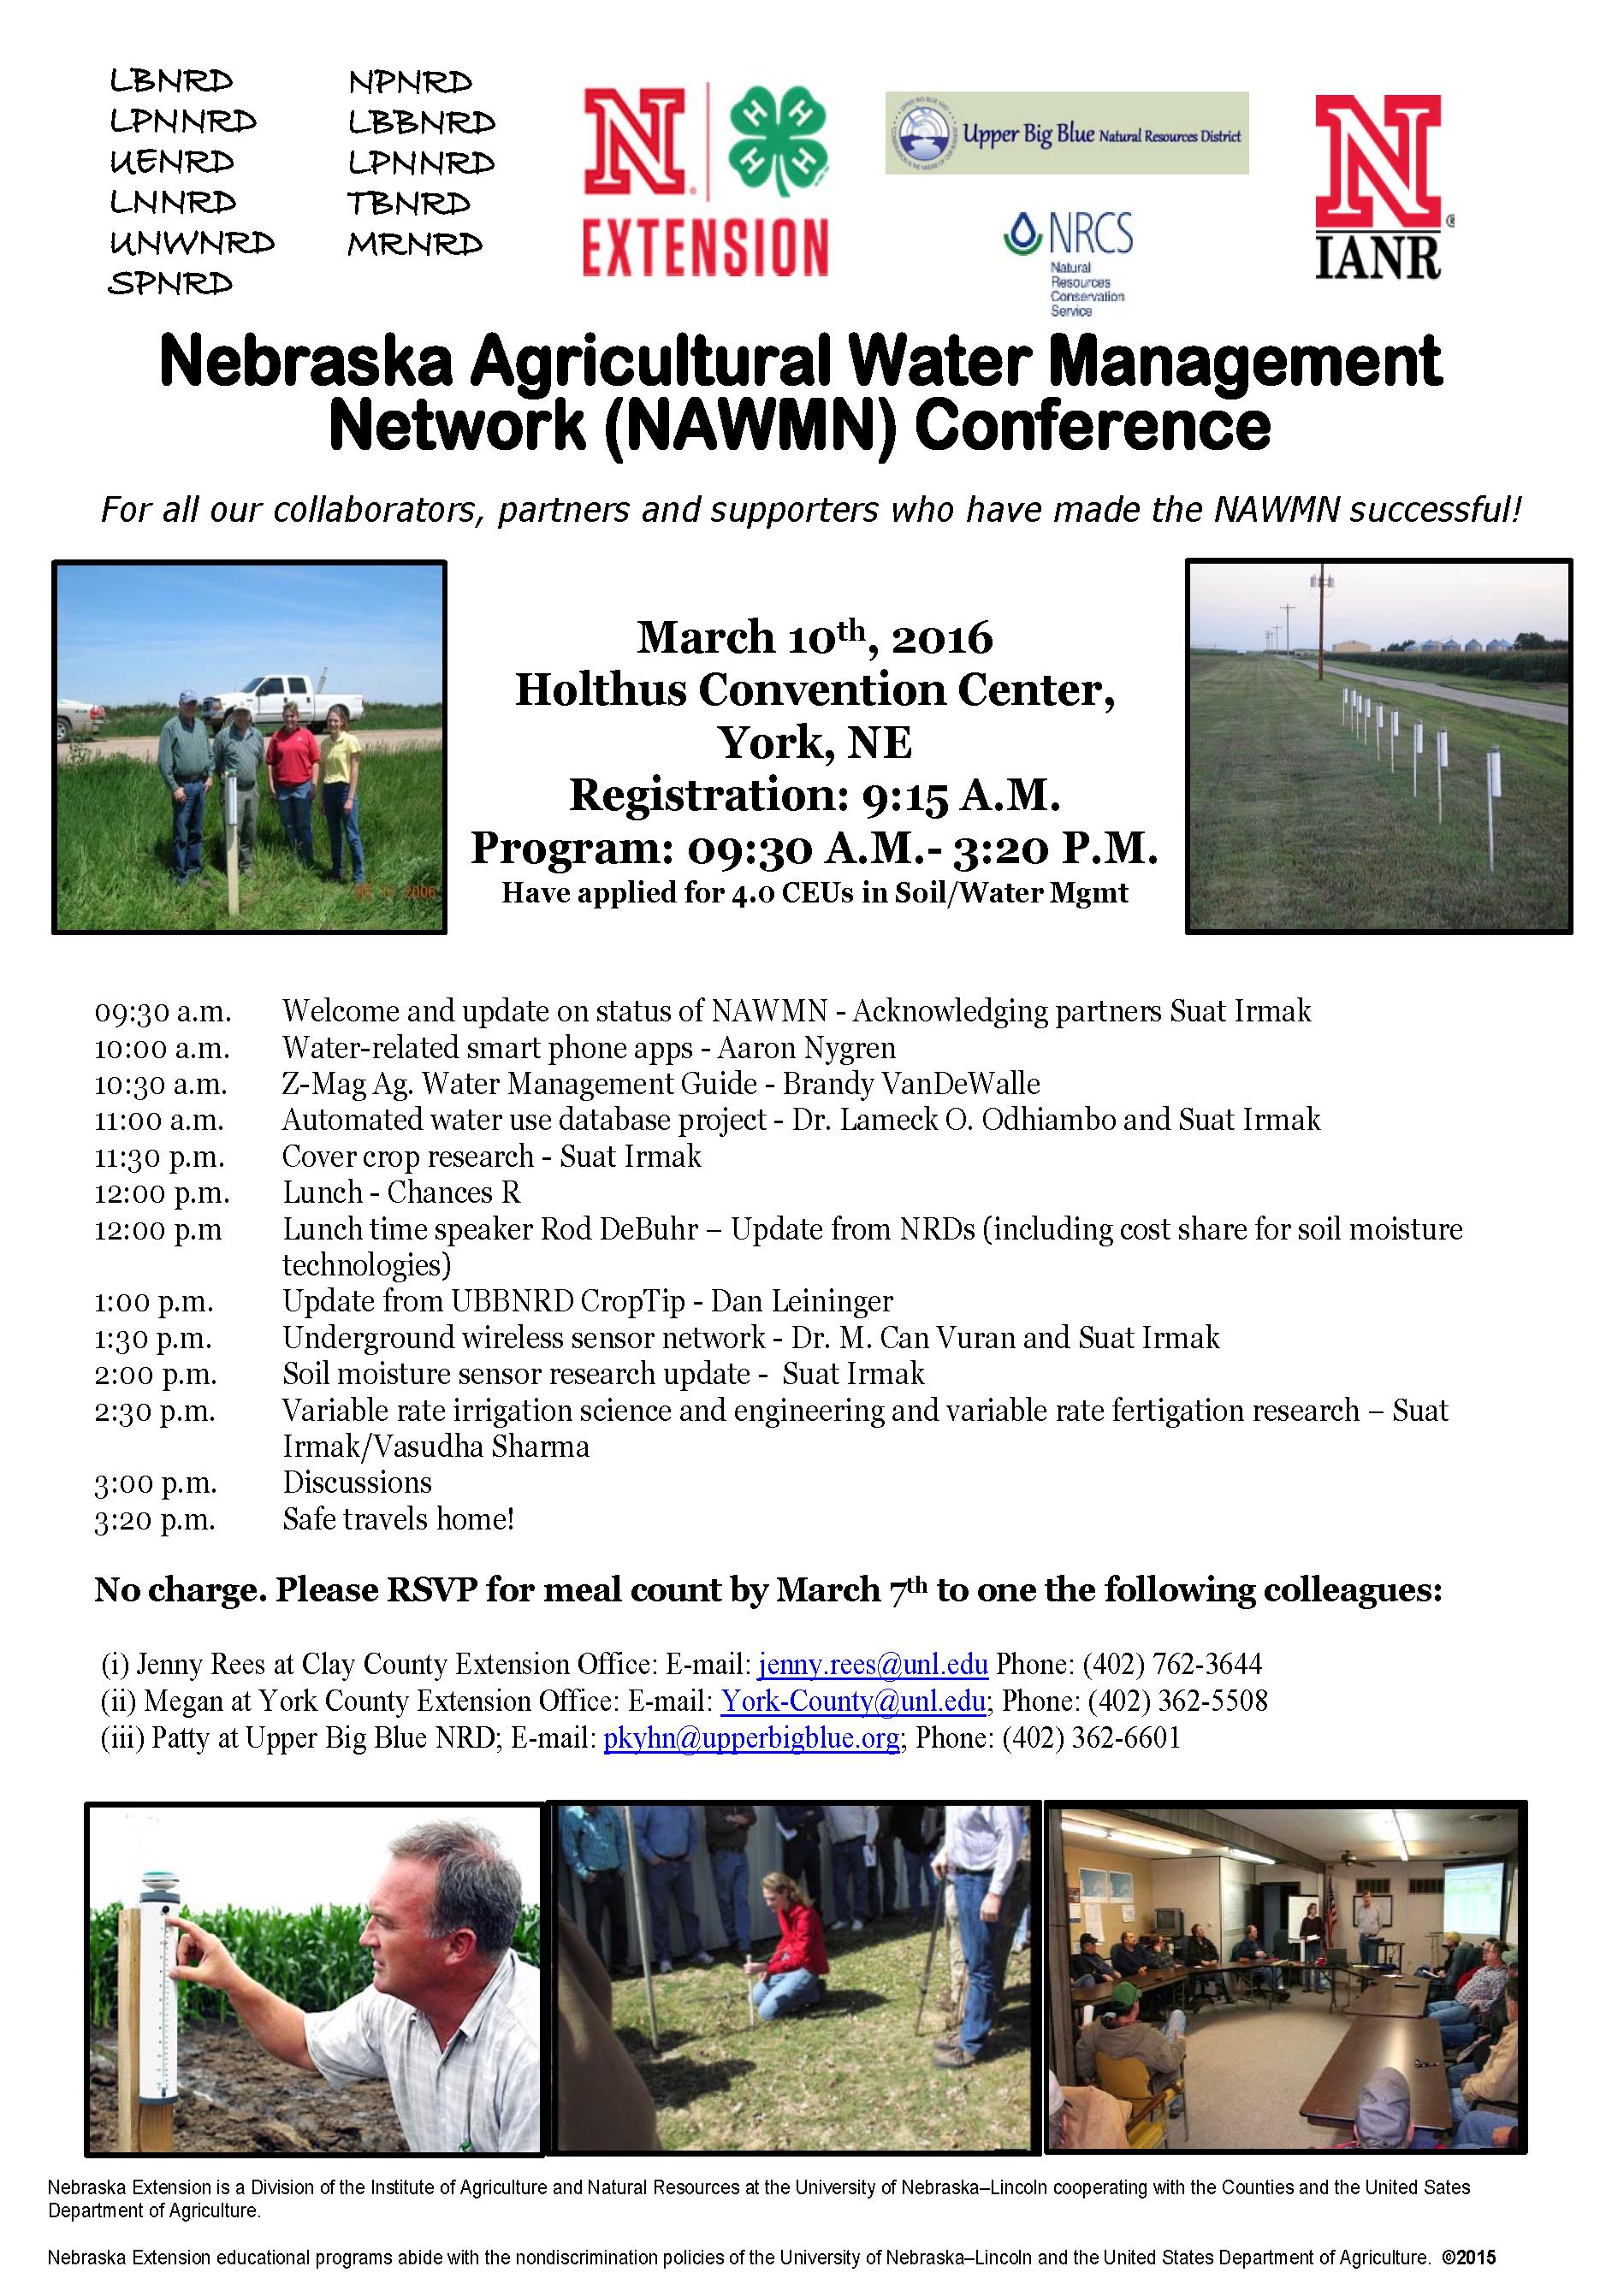 Irmak_NAWMN Meeting Agenda-Flier March 10 2016-CEUadded